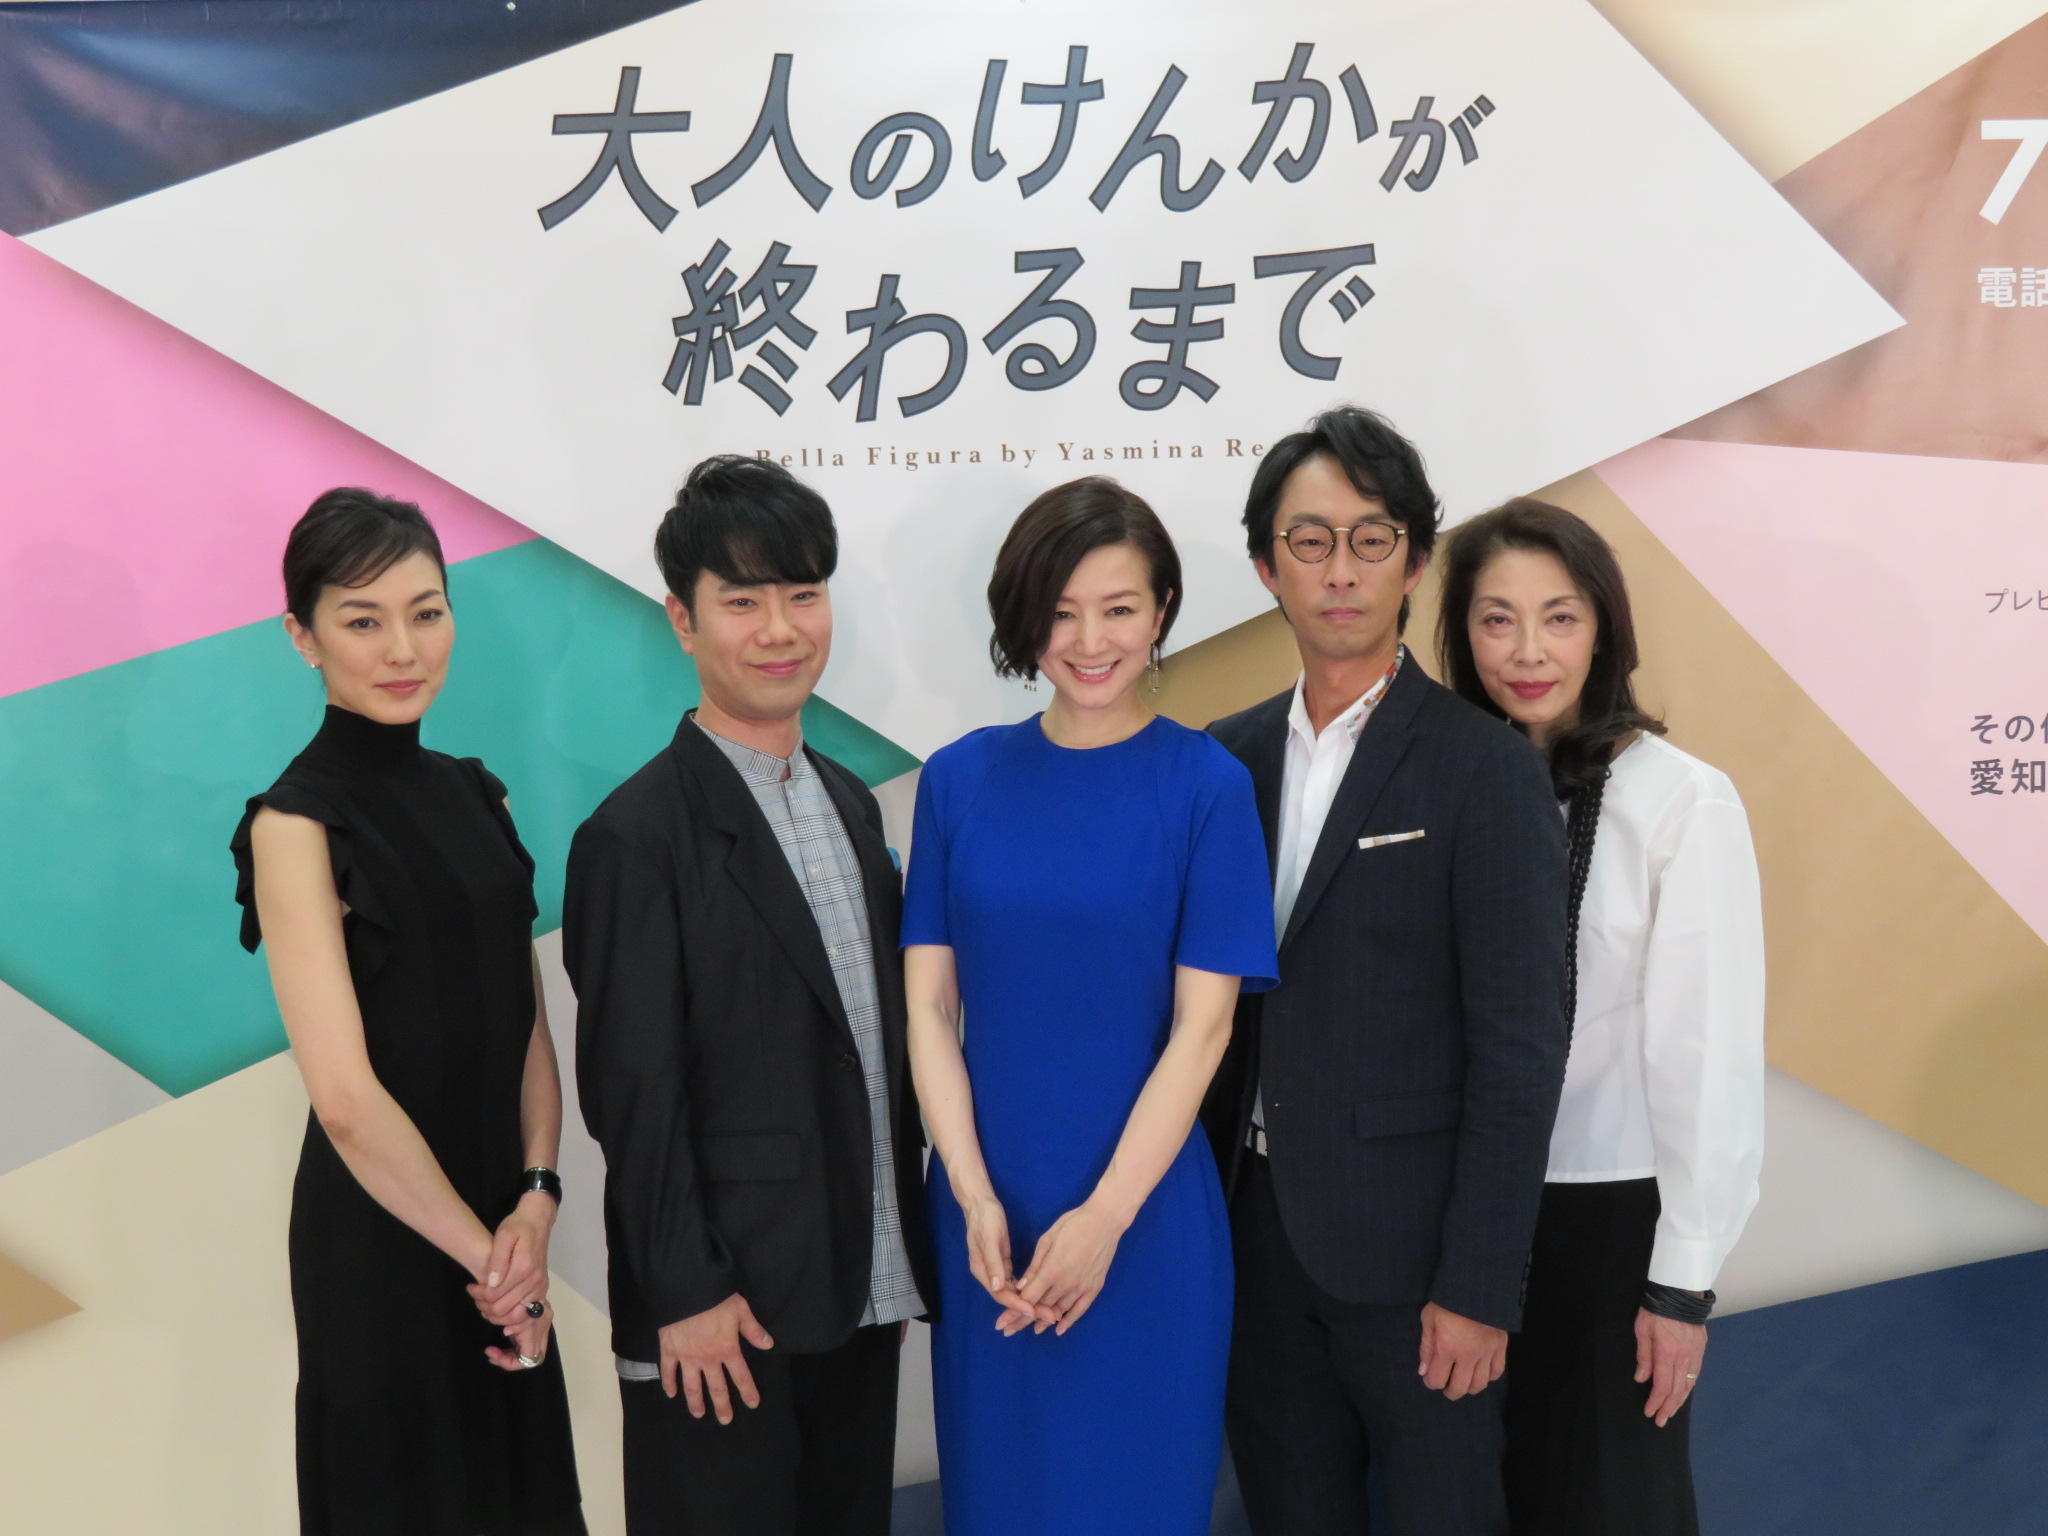 http://news.yoshimoto.co.jp/20180510193159-ebea0b1f5944a91f93f681b12c6f87682f484ac1.jpg